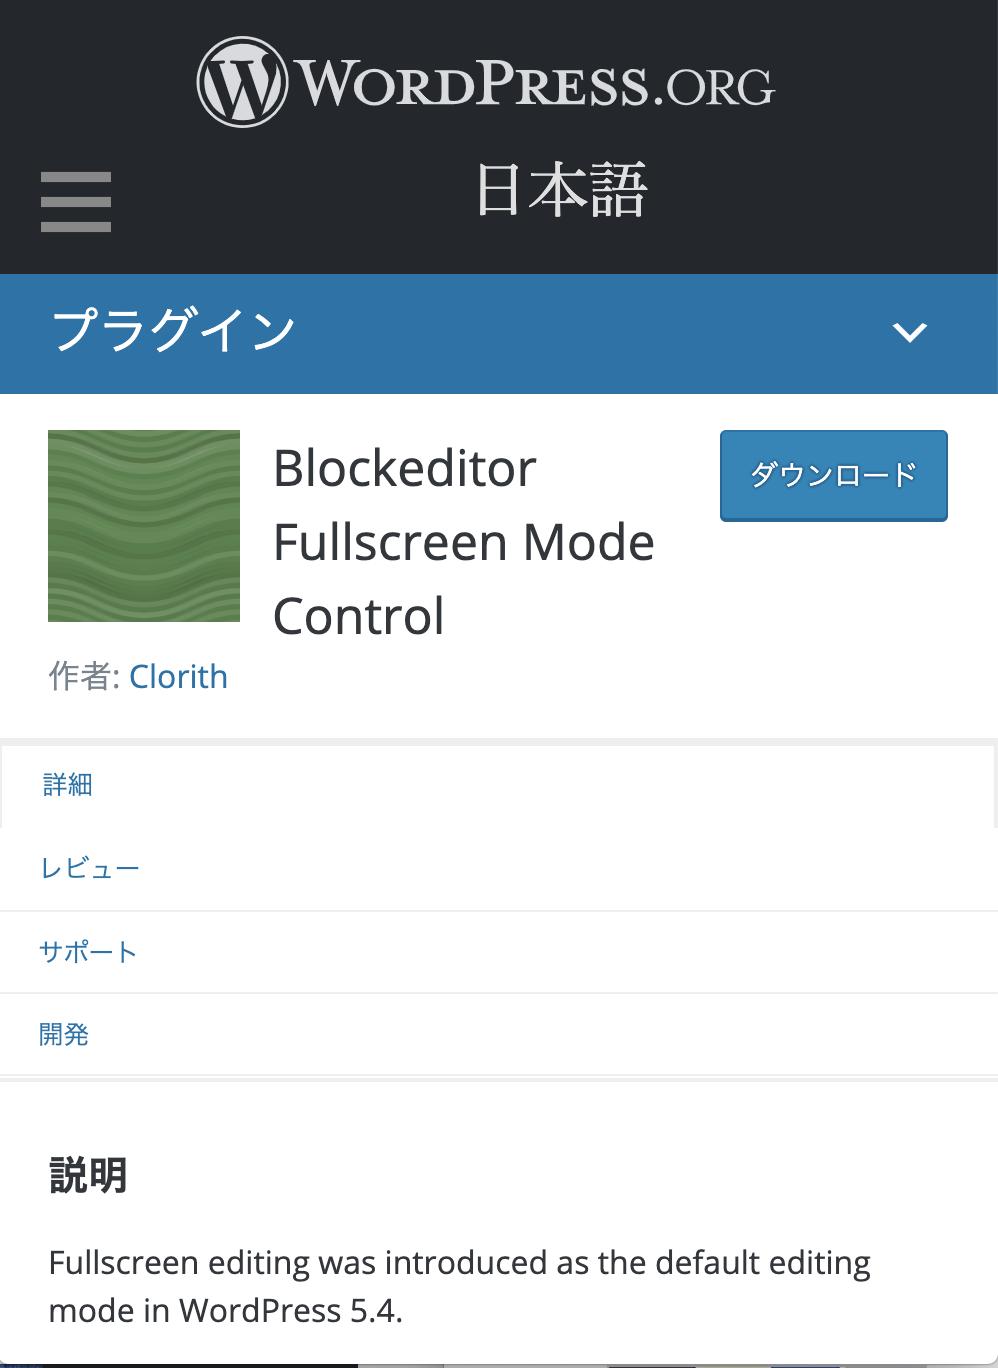 WordPress 5.4 ブロックエディターのフルスクリーンモードを制御するプラグイン Blockeditor Fullscreen Mode Control